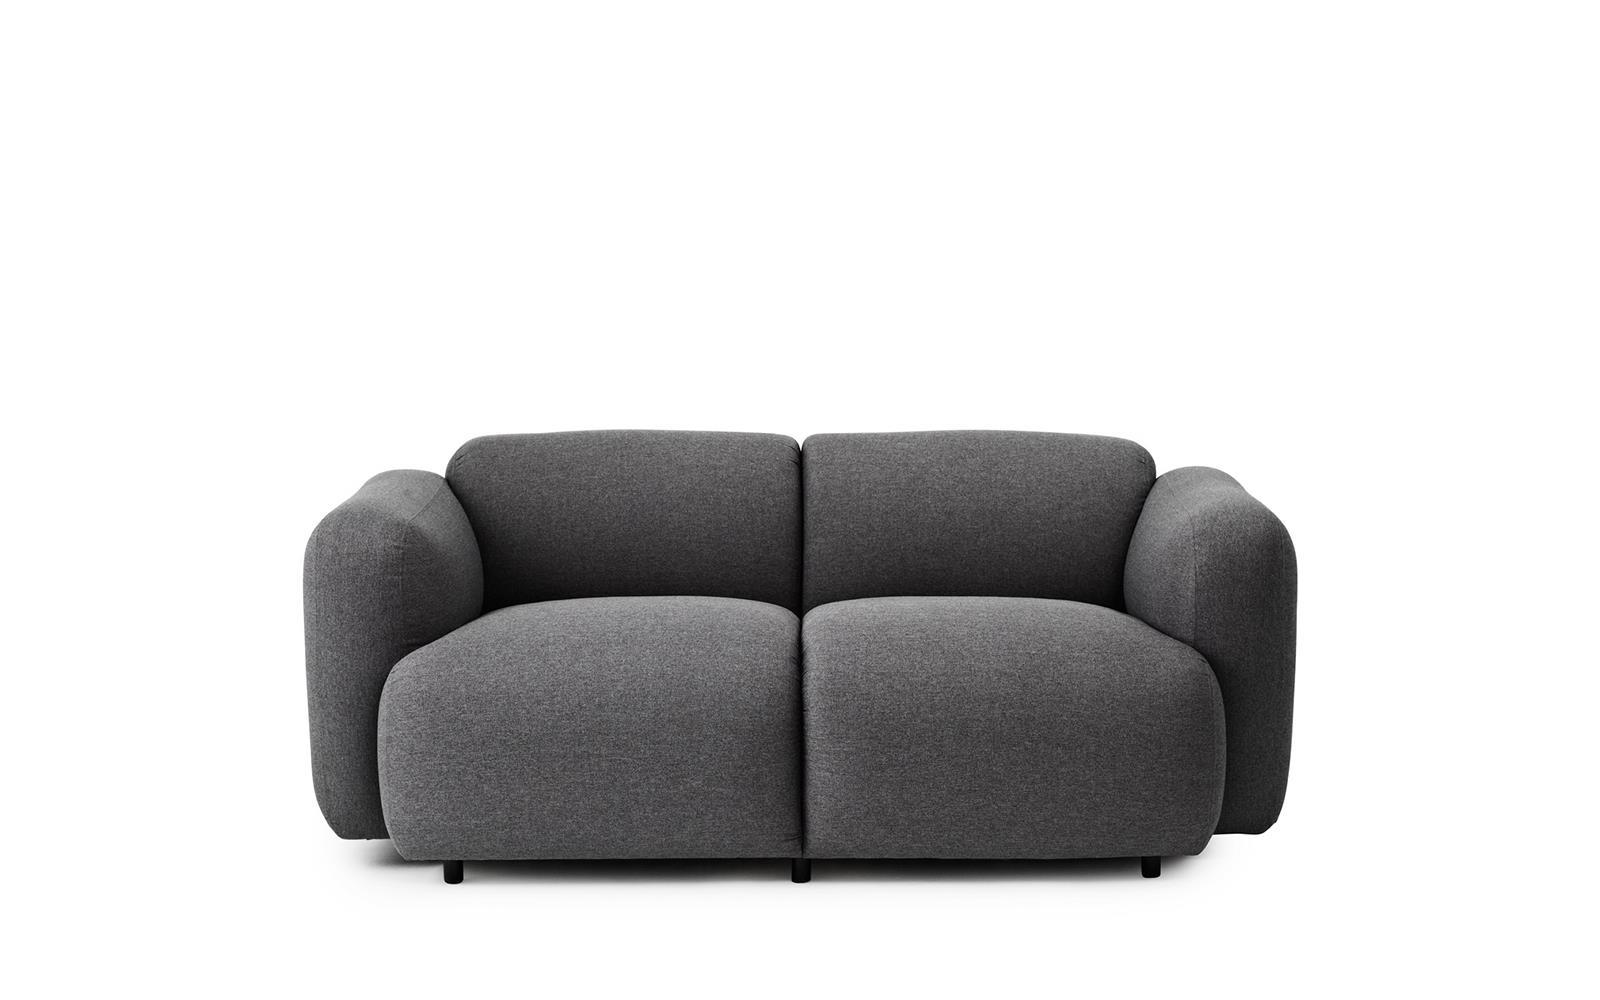 Incredible Swell Sofa 2 Seater Breeze Fusion Spiritservingveterans Wood Chair Design Ideas Spiritservingveteransorg